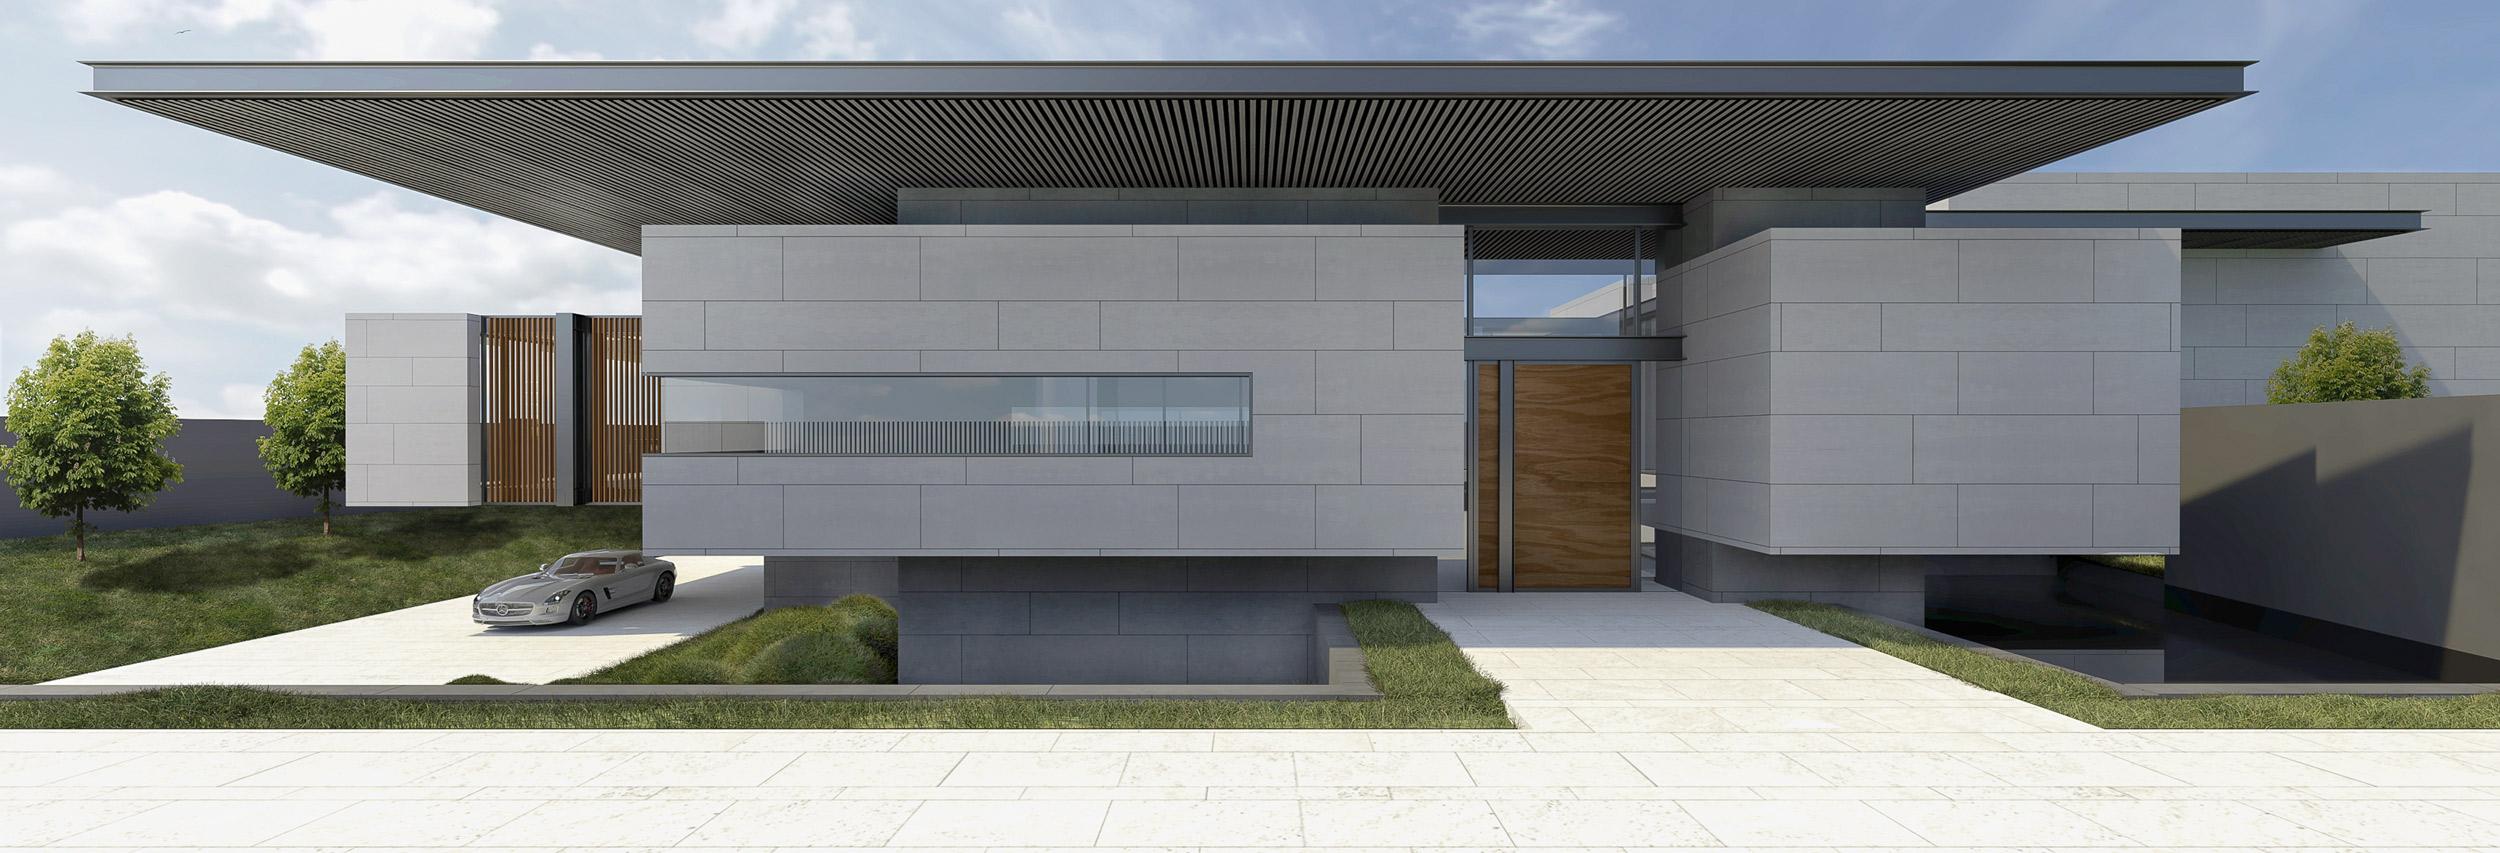 echmiadzin-house-armenia-archillusion-design-artur-nesterenko-02.jpg